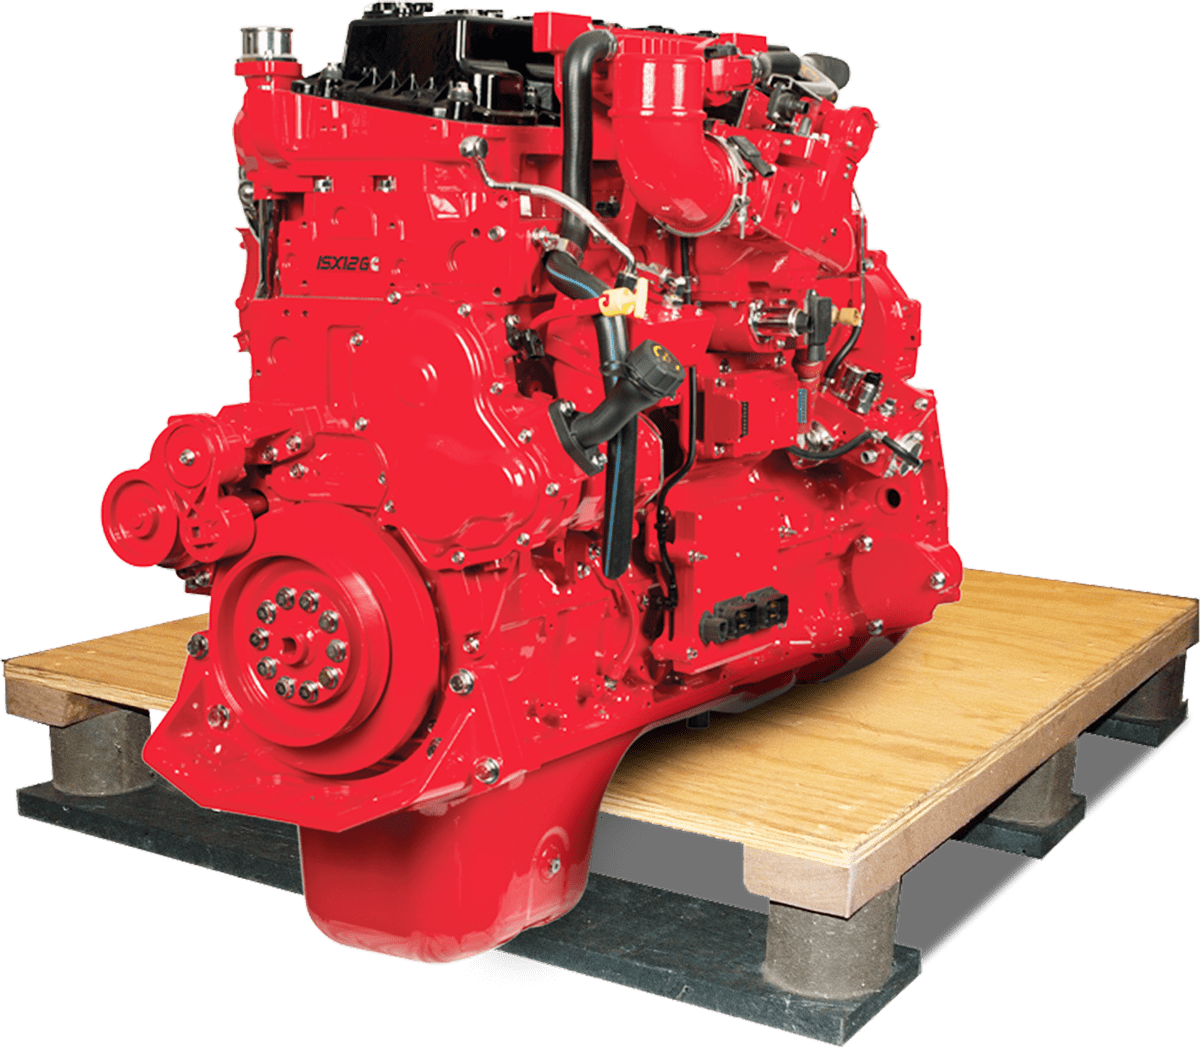 Cummins Engine Overhaul Special